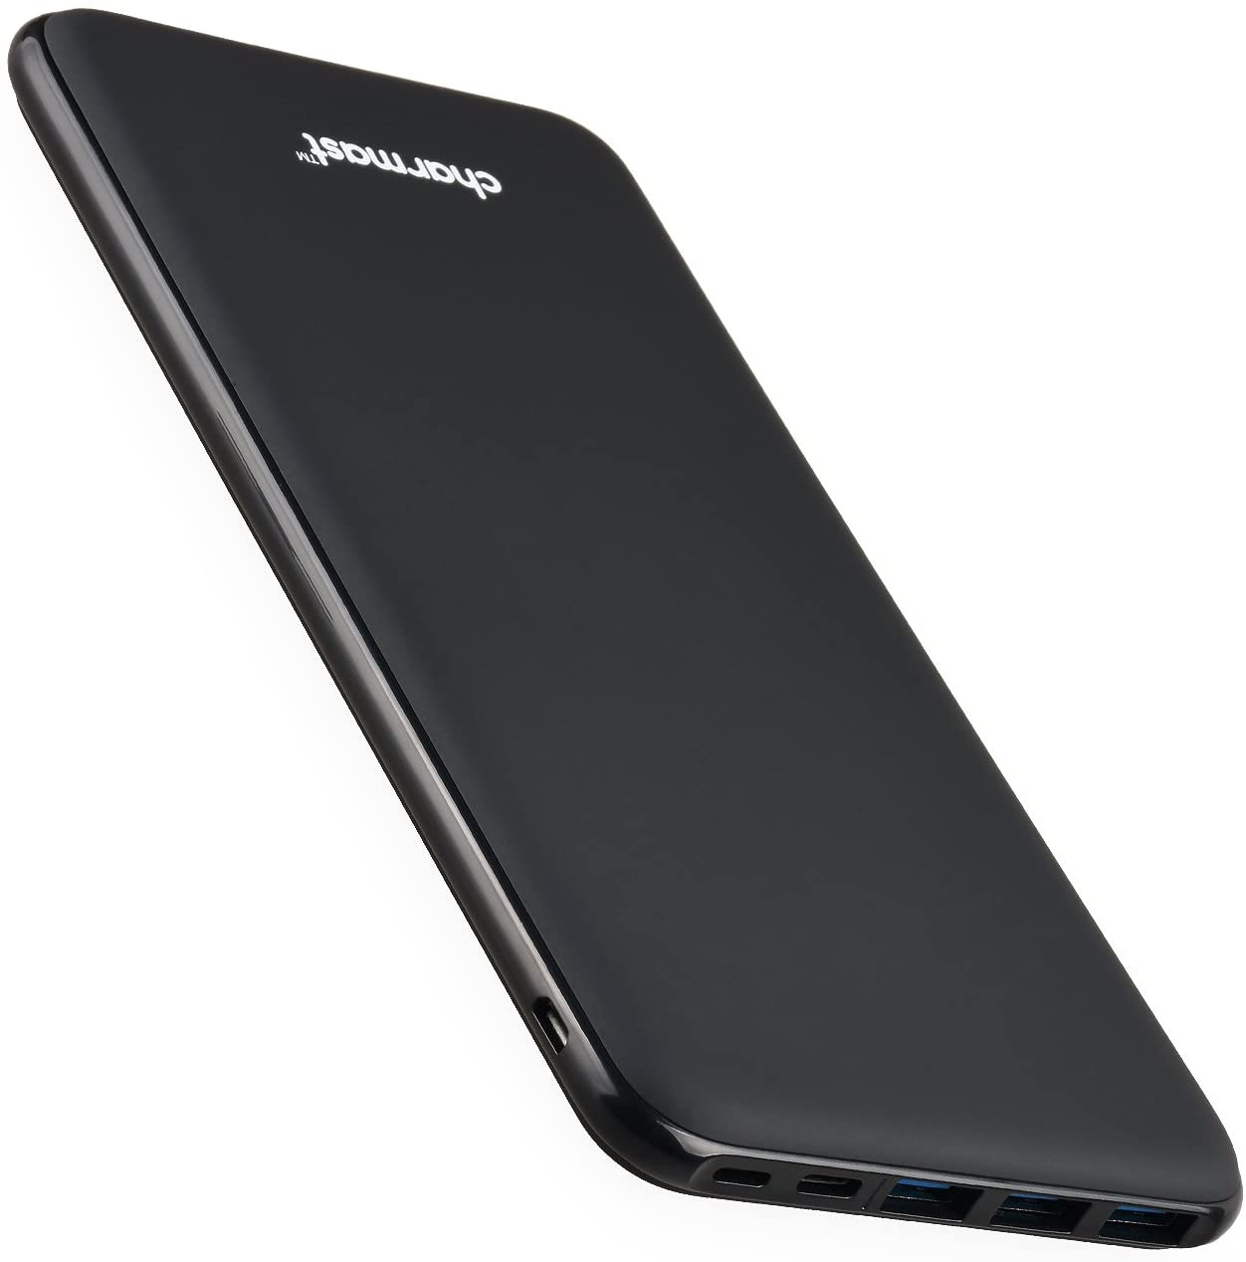 Charmast® 26800mAh Powerbank Batería Externa Delgado con 3 Entradas&4 Salidas USB/Tipo C para Nintendo Switch Nexus iPad iPhone Samsung Huawei BQ LG Android Teléfono Móvil (Negro)